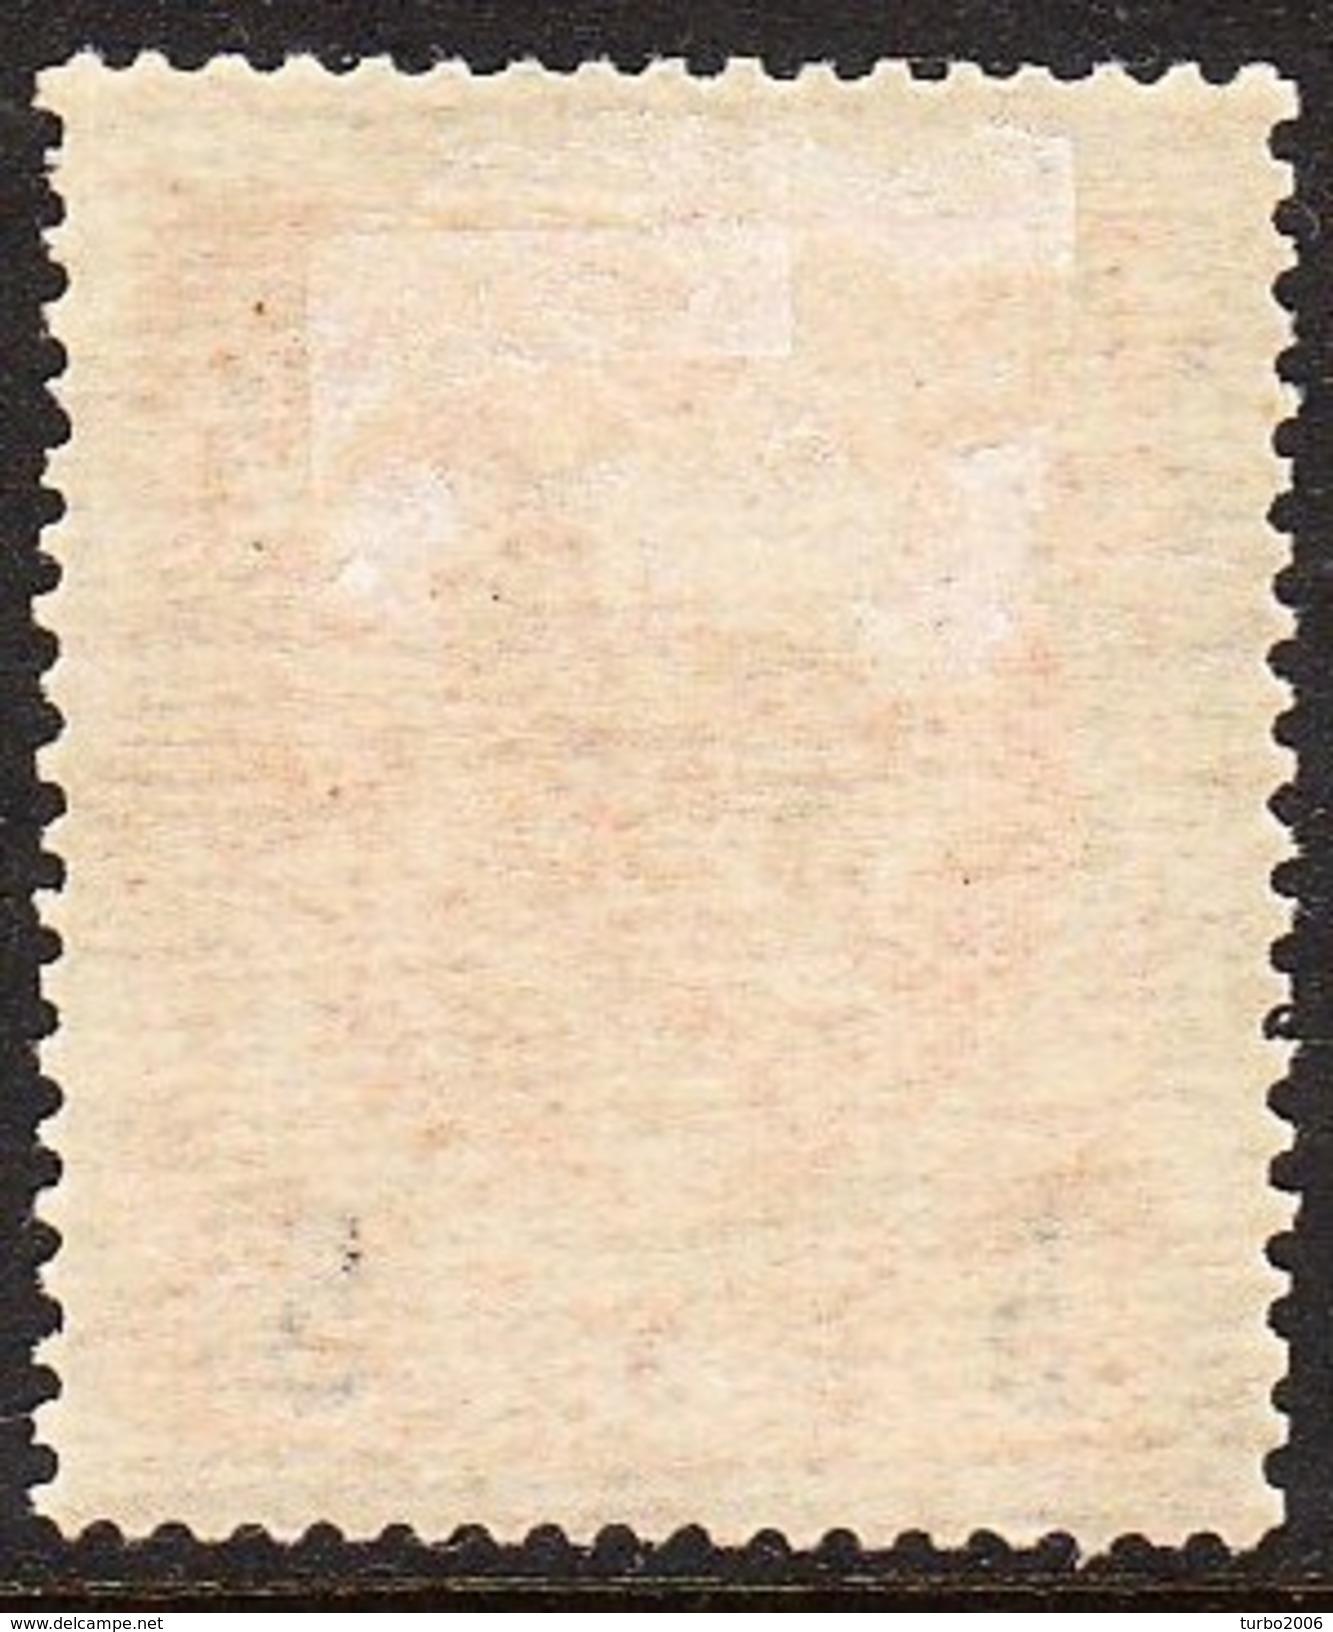 CRETE 1904 Cretan Stamp 20 L. Orange Overprinted 5  5  In Black Vl. 24 MH - Kreta